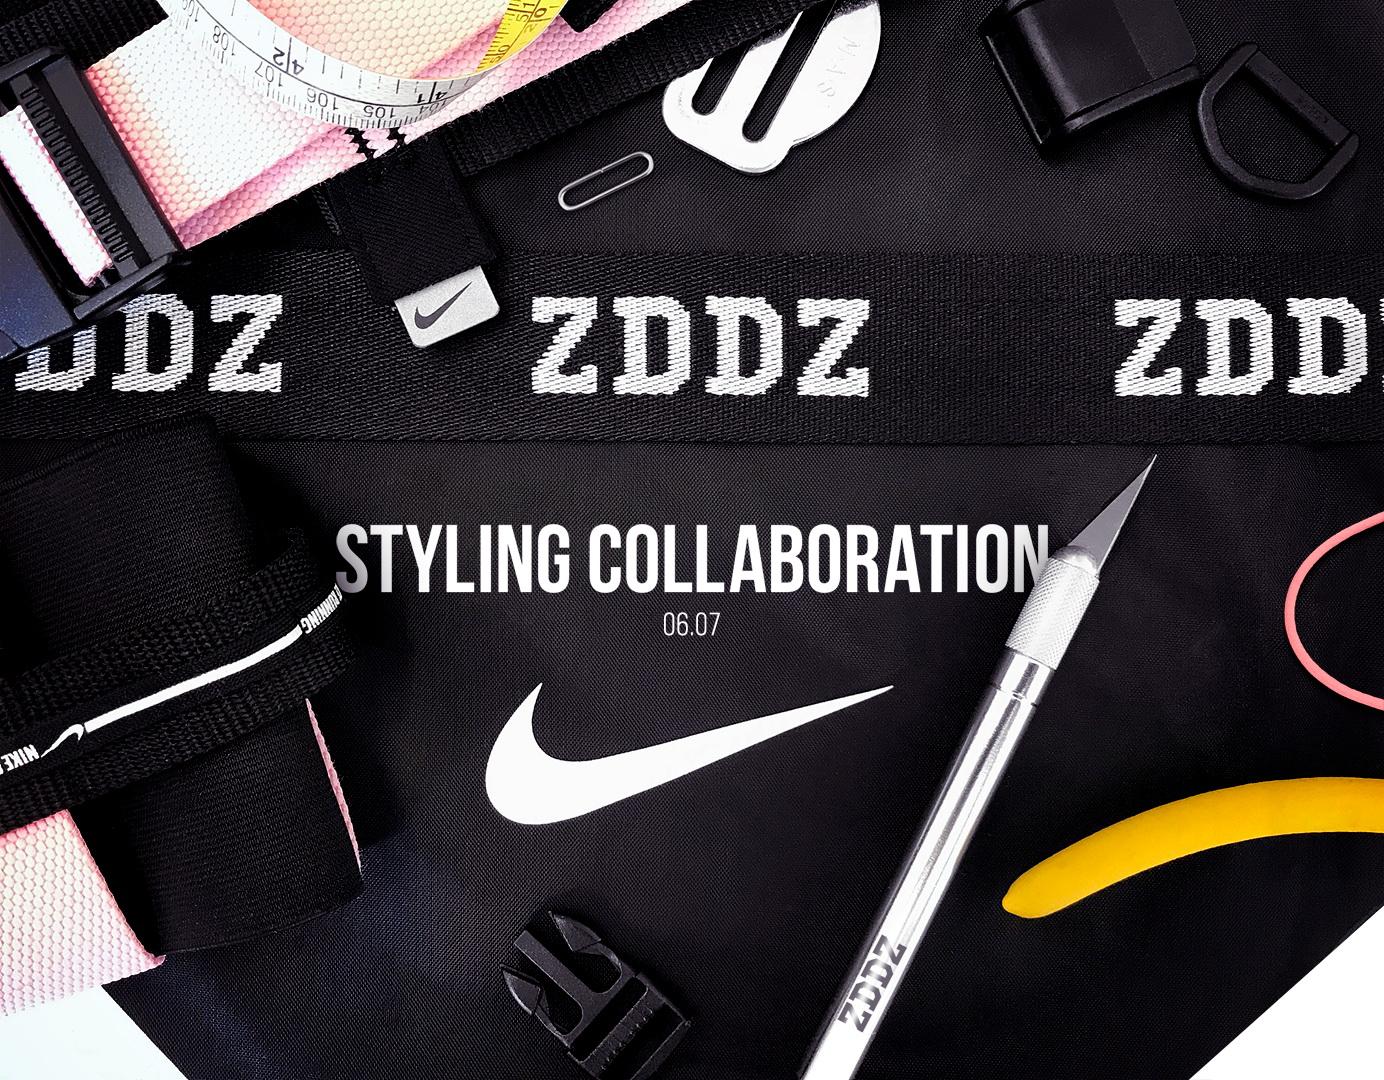 ZDDZ and Nike Collaboration 2017